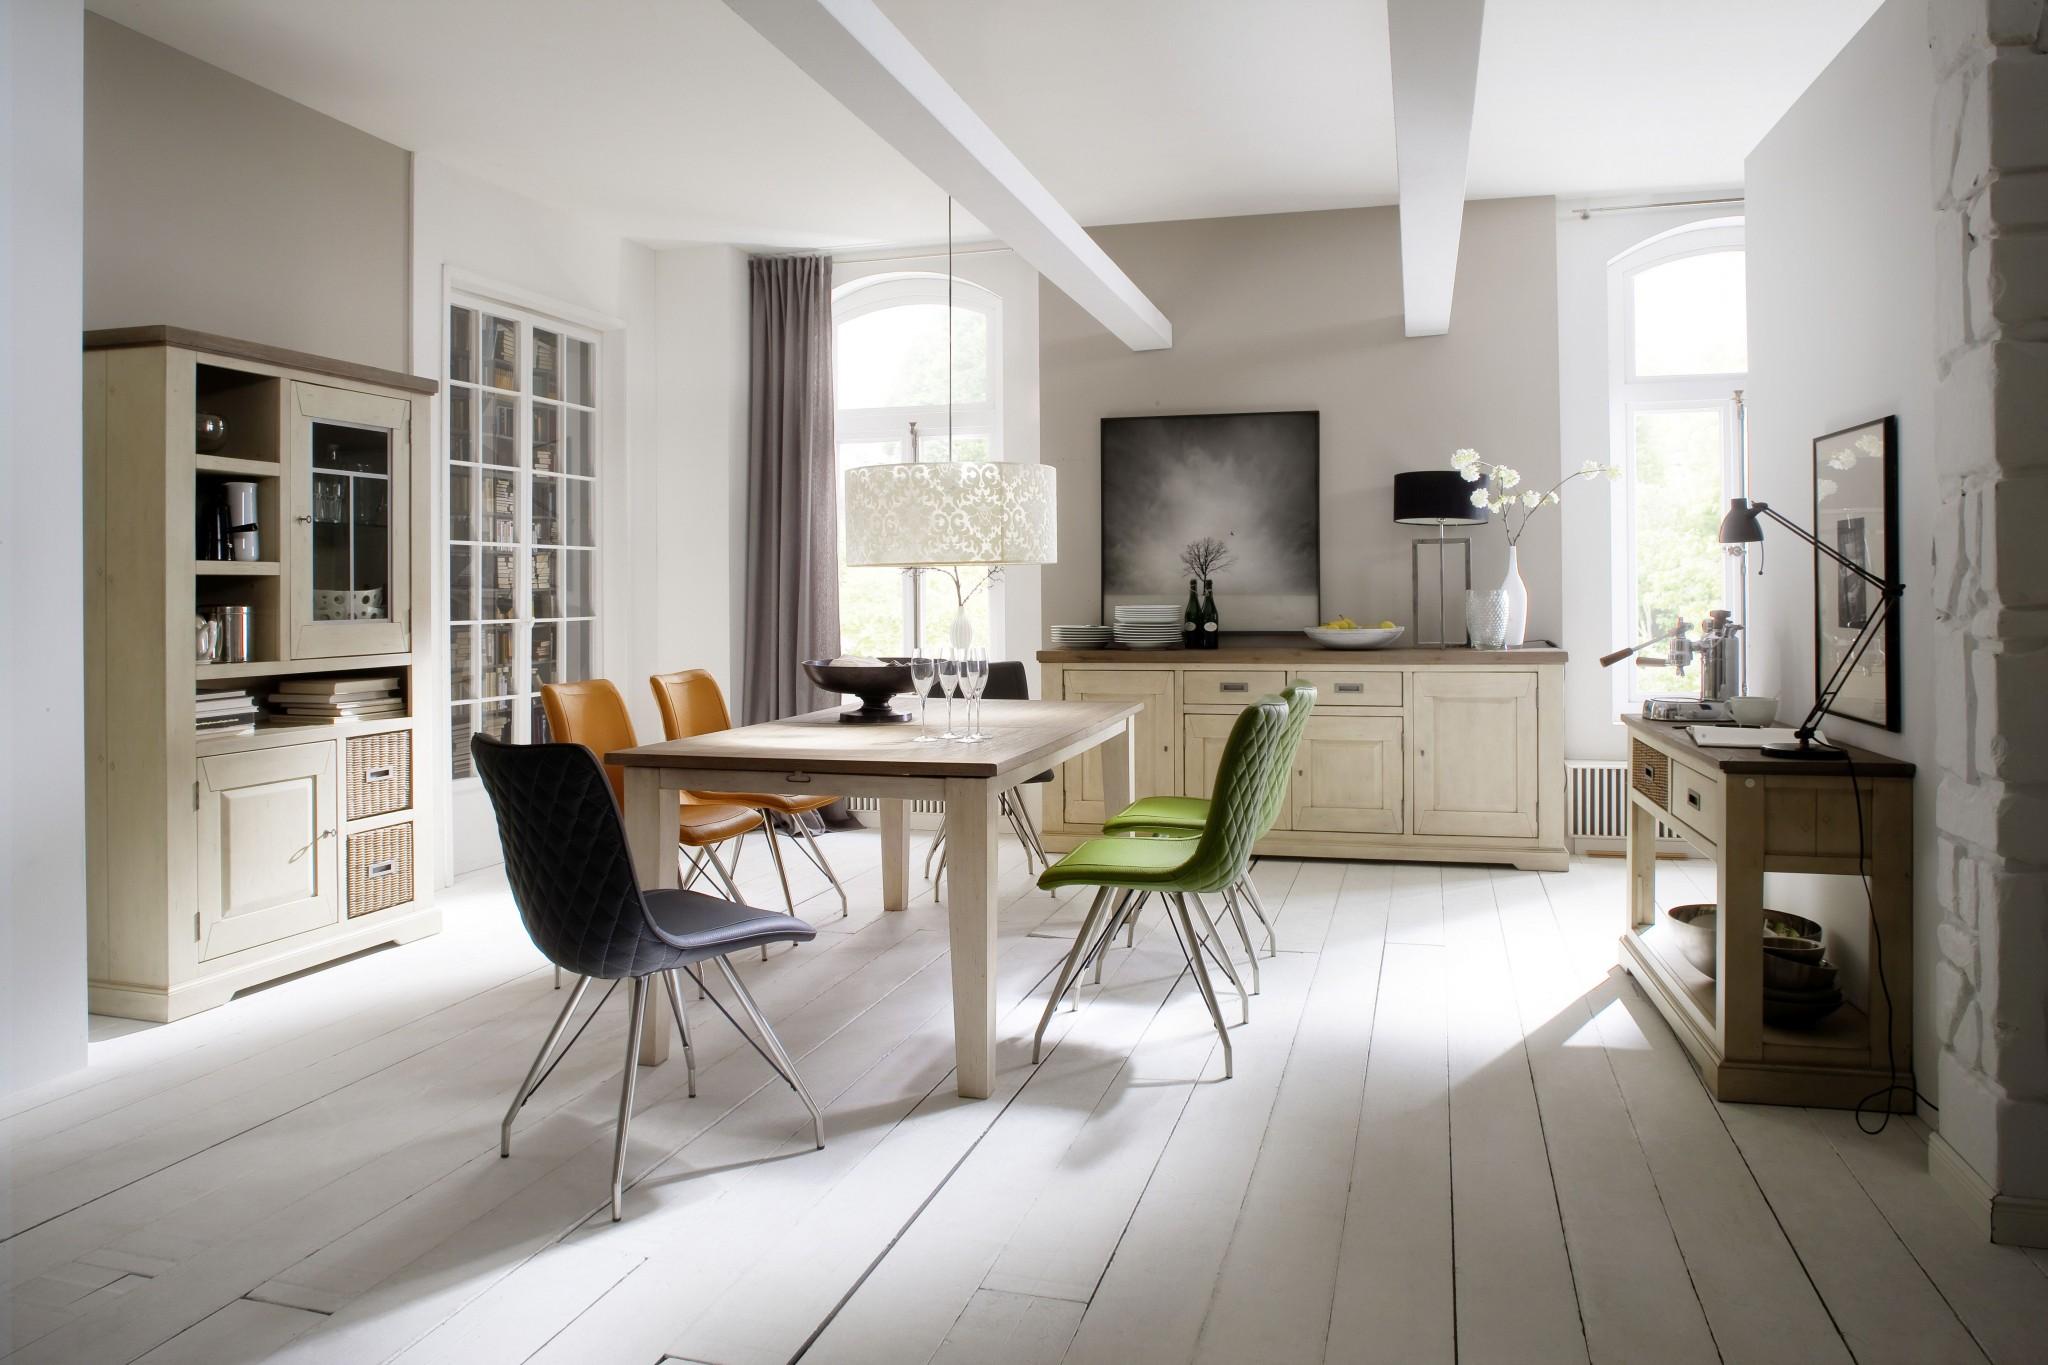 esszimmer la natura im vintagestil - möbel polt möbelhaus, Esszimmer dekoo